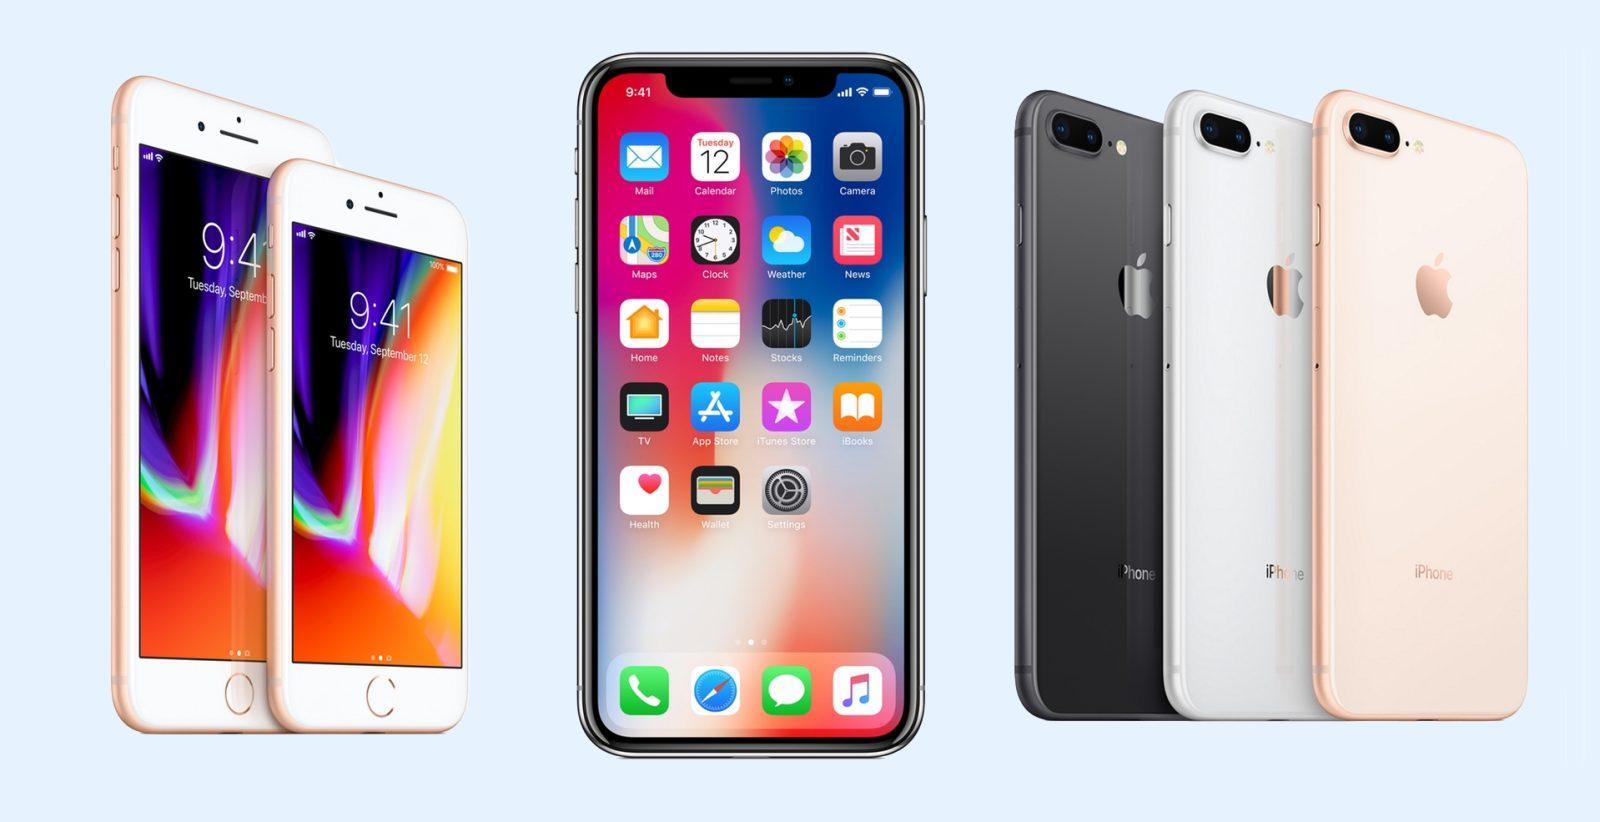 iphone-x-iphone-8-compared